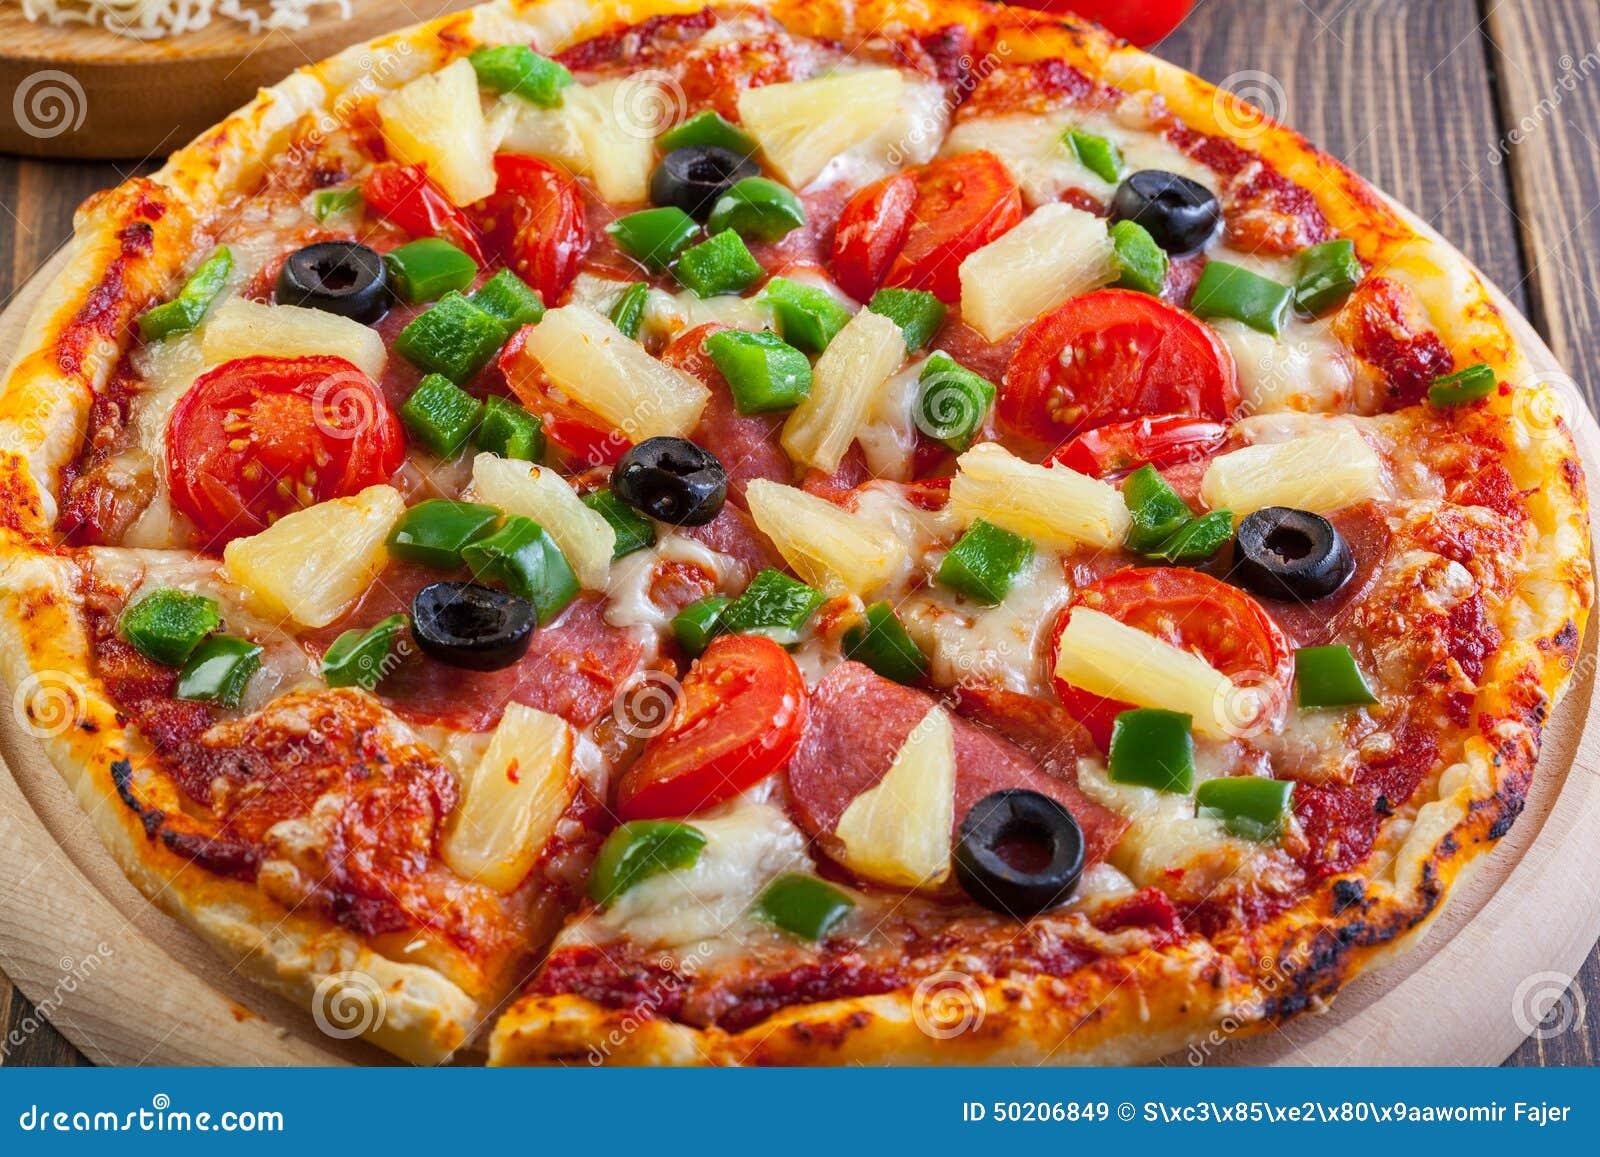 fresh baked pizza hawaii stock image image of cuisine 50206849. Black Bedroom Furniture Sets. Home Design Ideas